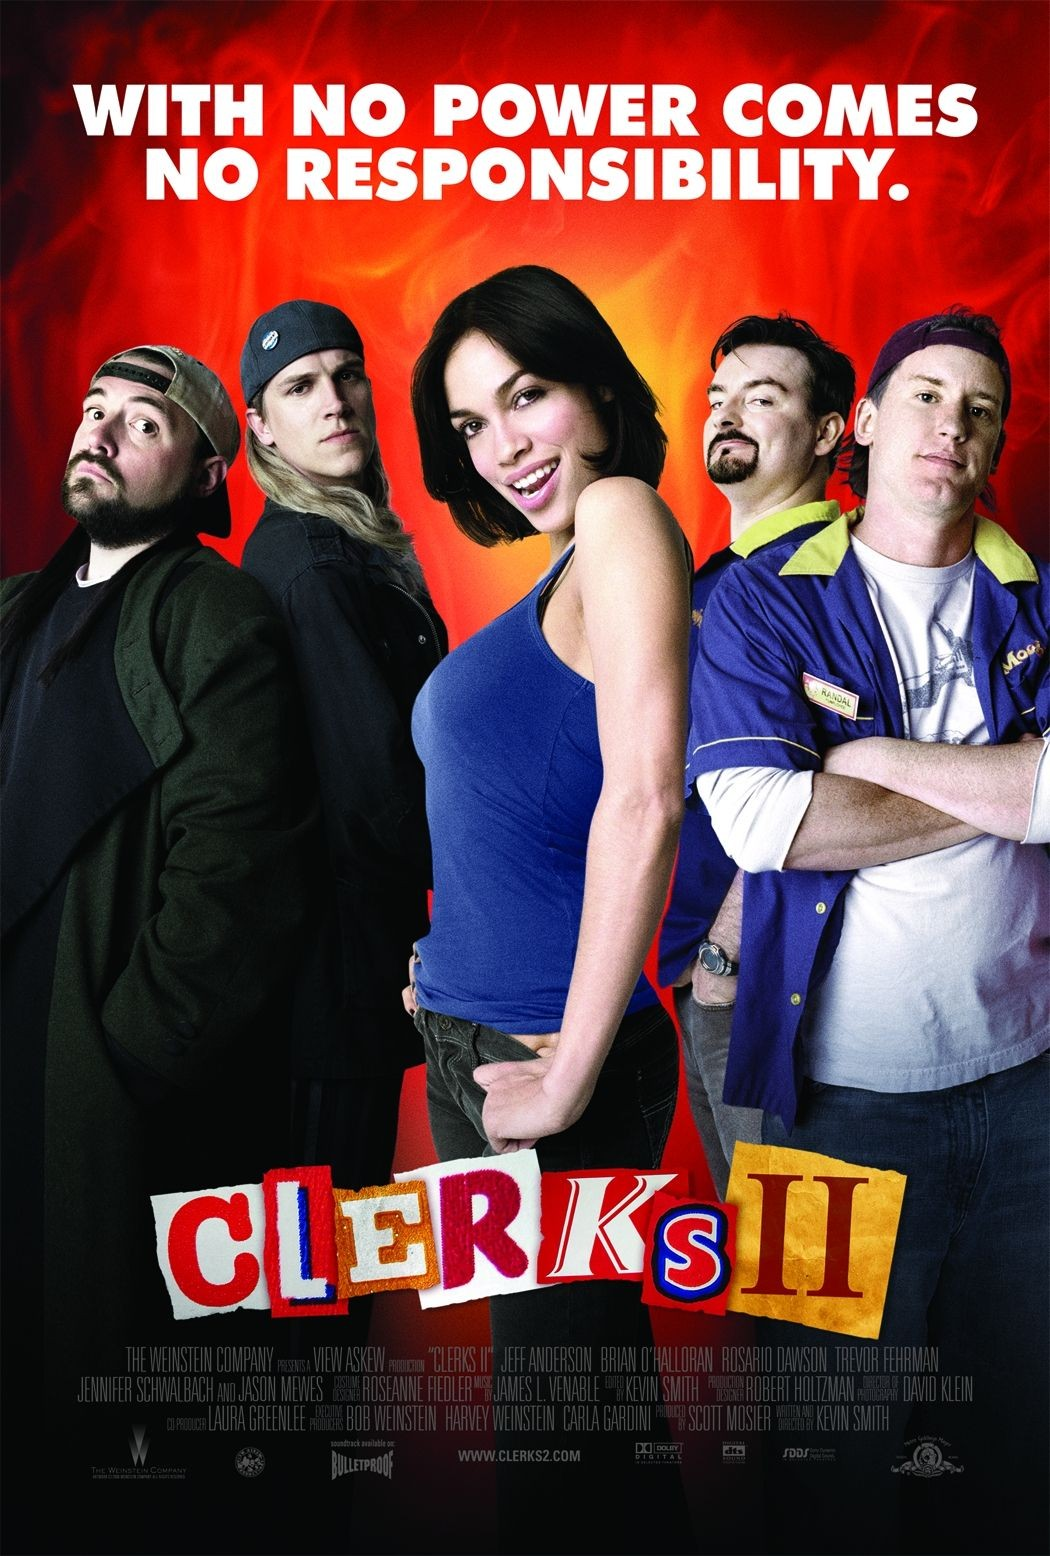 http://1.bp.blogspot.com/-S-IgfckqZpk/UN-2rirUPbI/AAAAAAAAA9c/059c7UR7lKU/s1600/Clerks+2+DVD+Jay+and+Silent+Bob.jpg